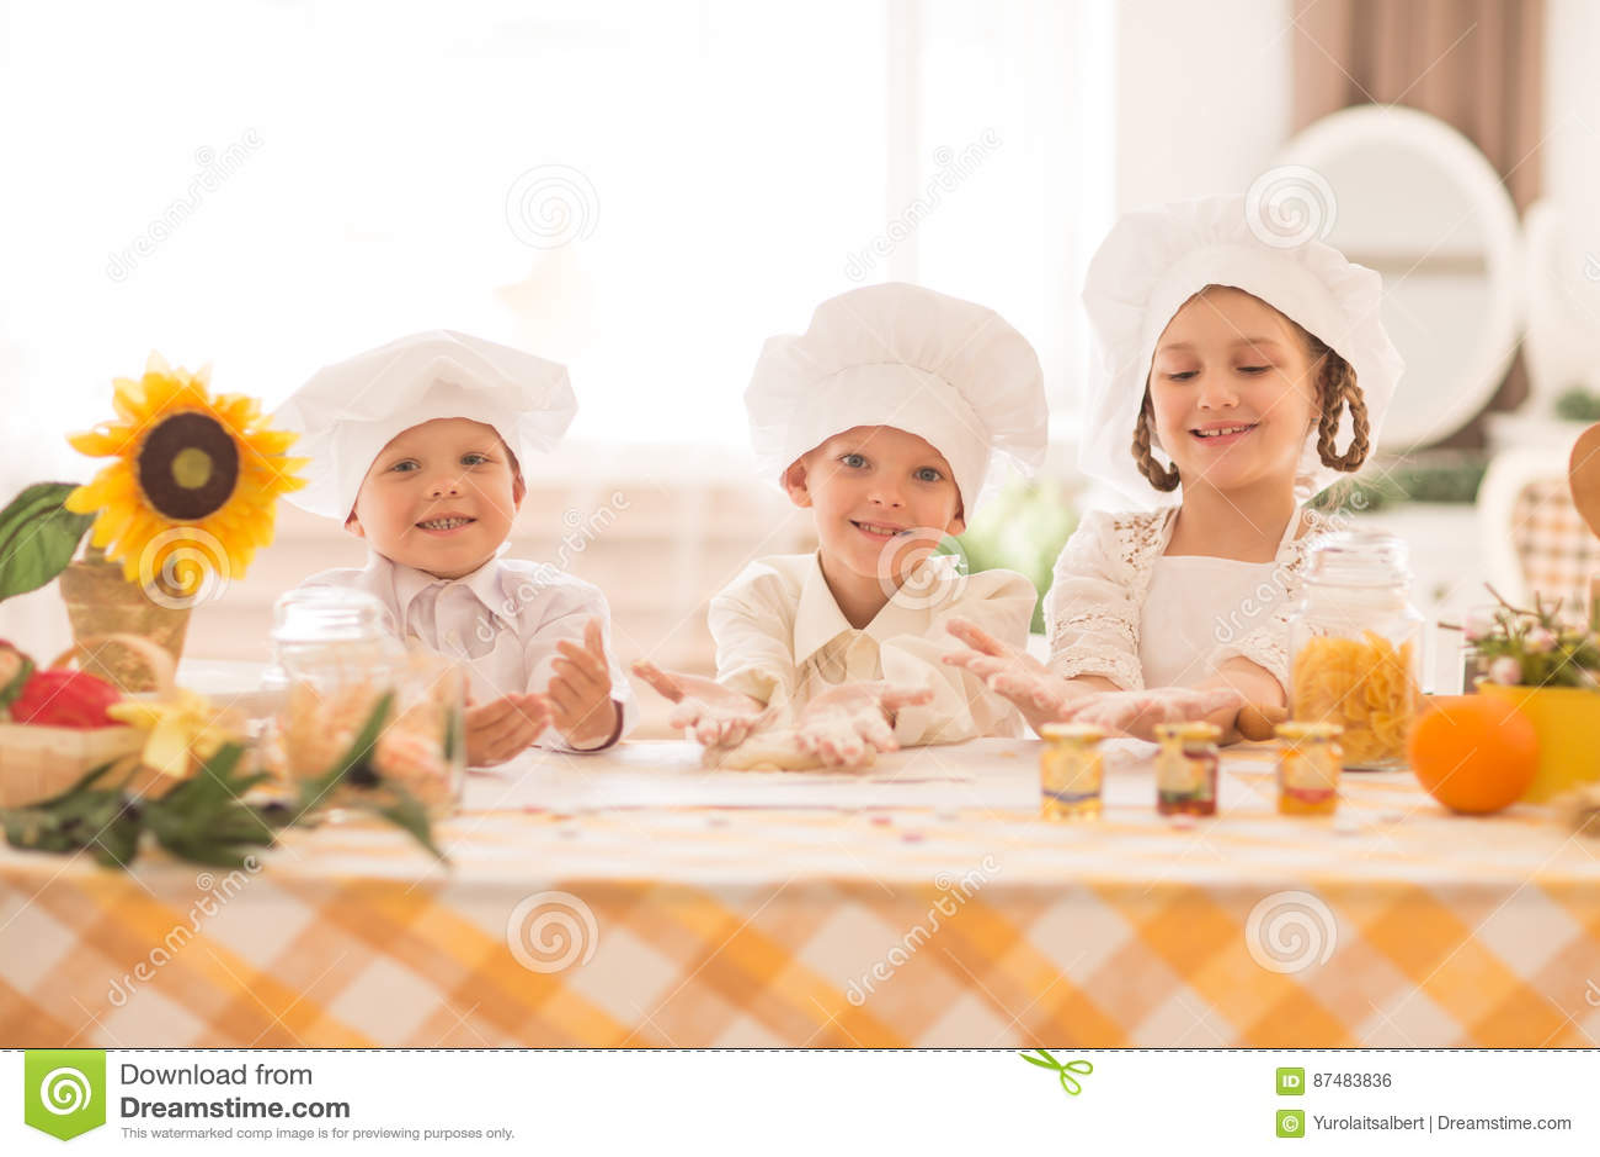 kid kitchens under cabinet shelving kitchen 以烹调一顿可口早餐的厨师的形式愉快的小孩在厨房里库存照片 图片包括有 以烹调一顿可口早餐的厨师的形式愉快的小孩厨房